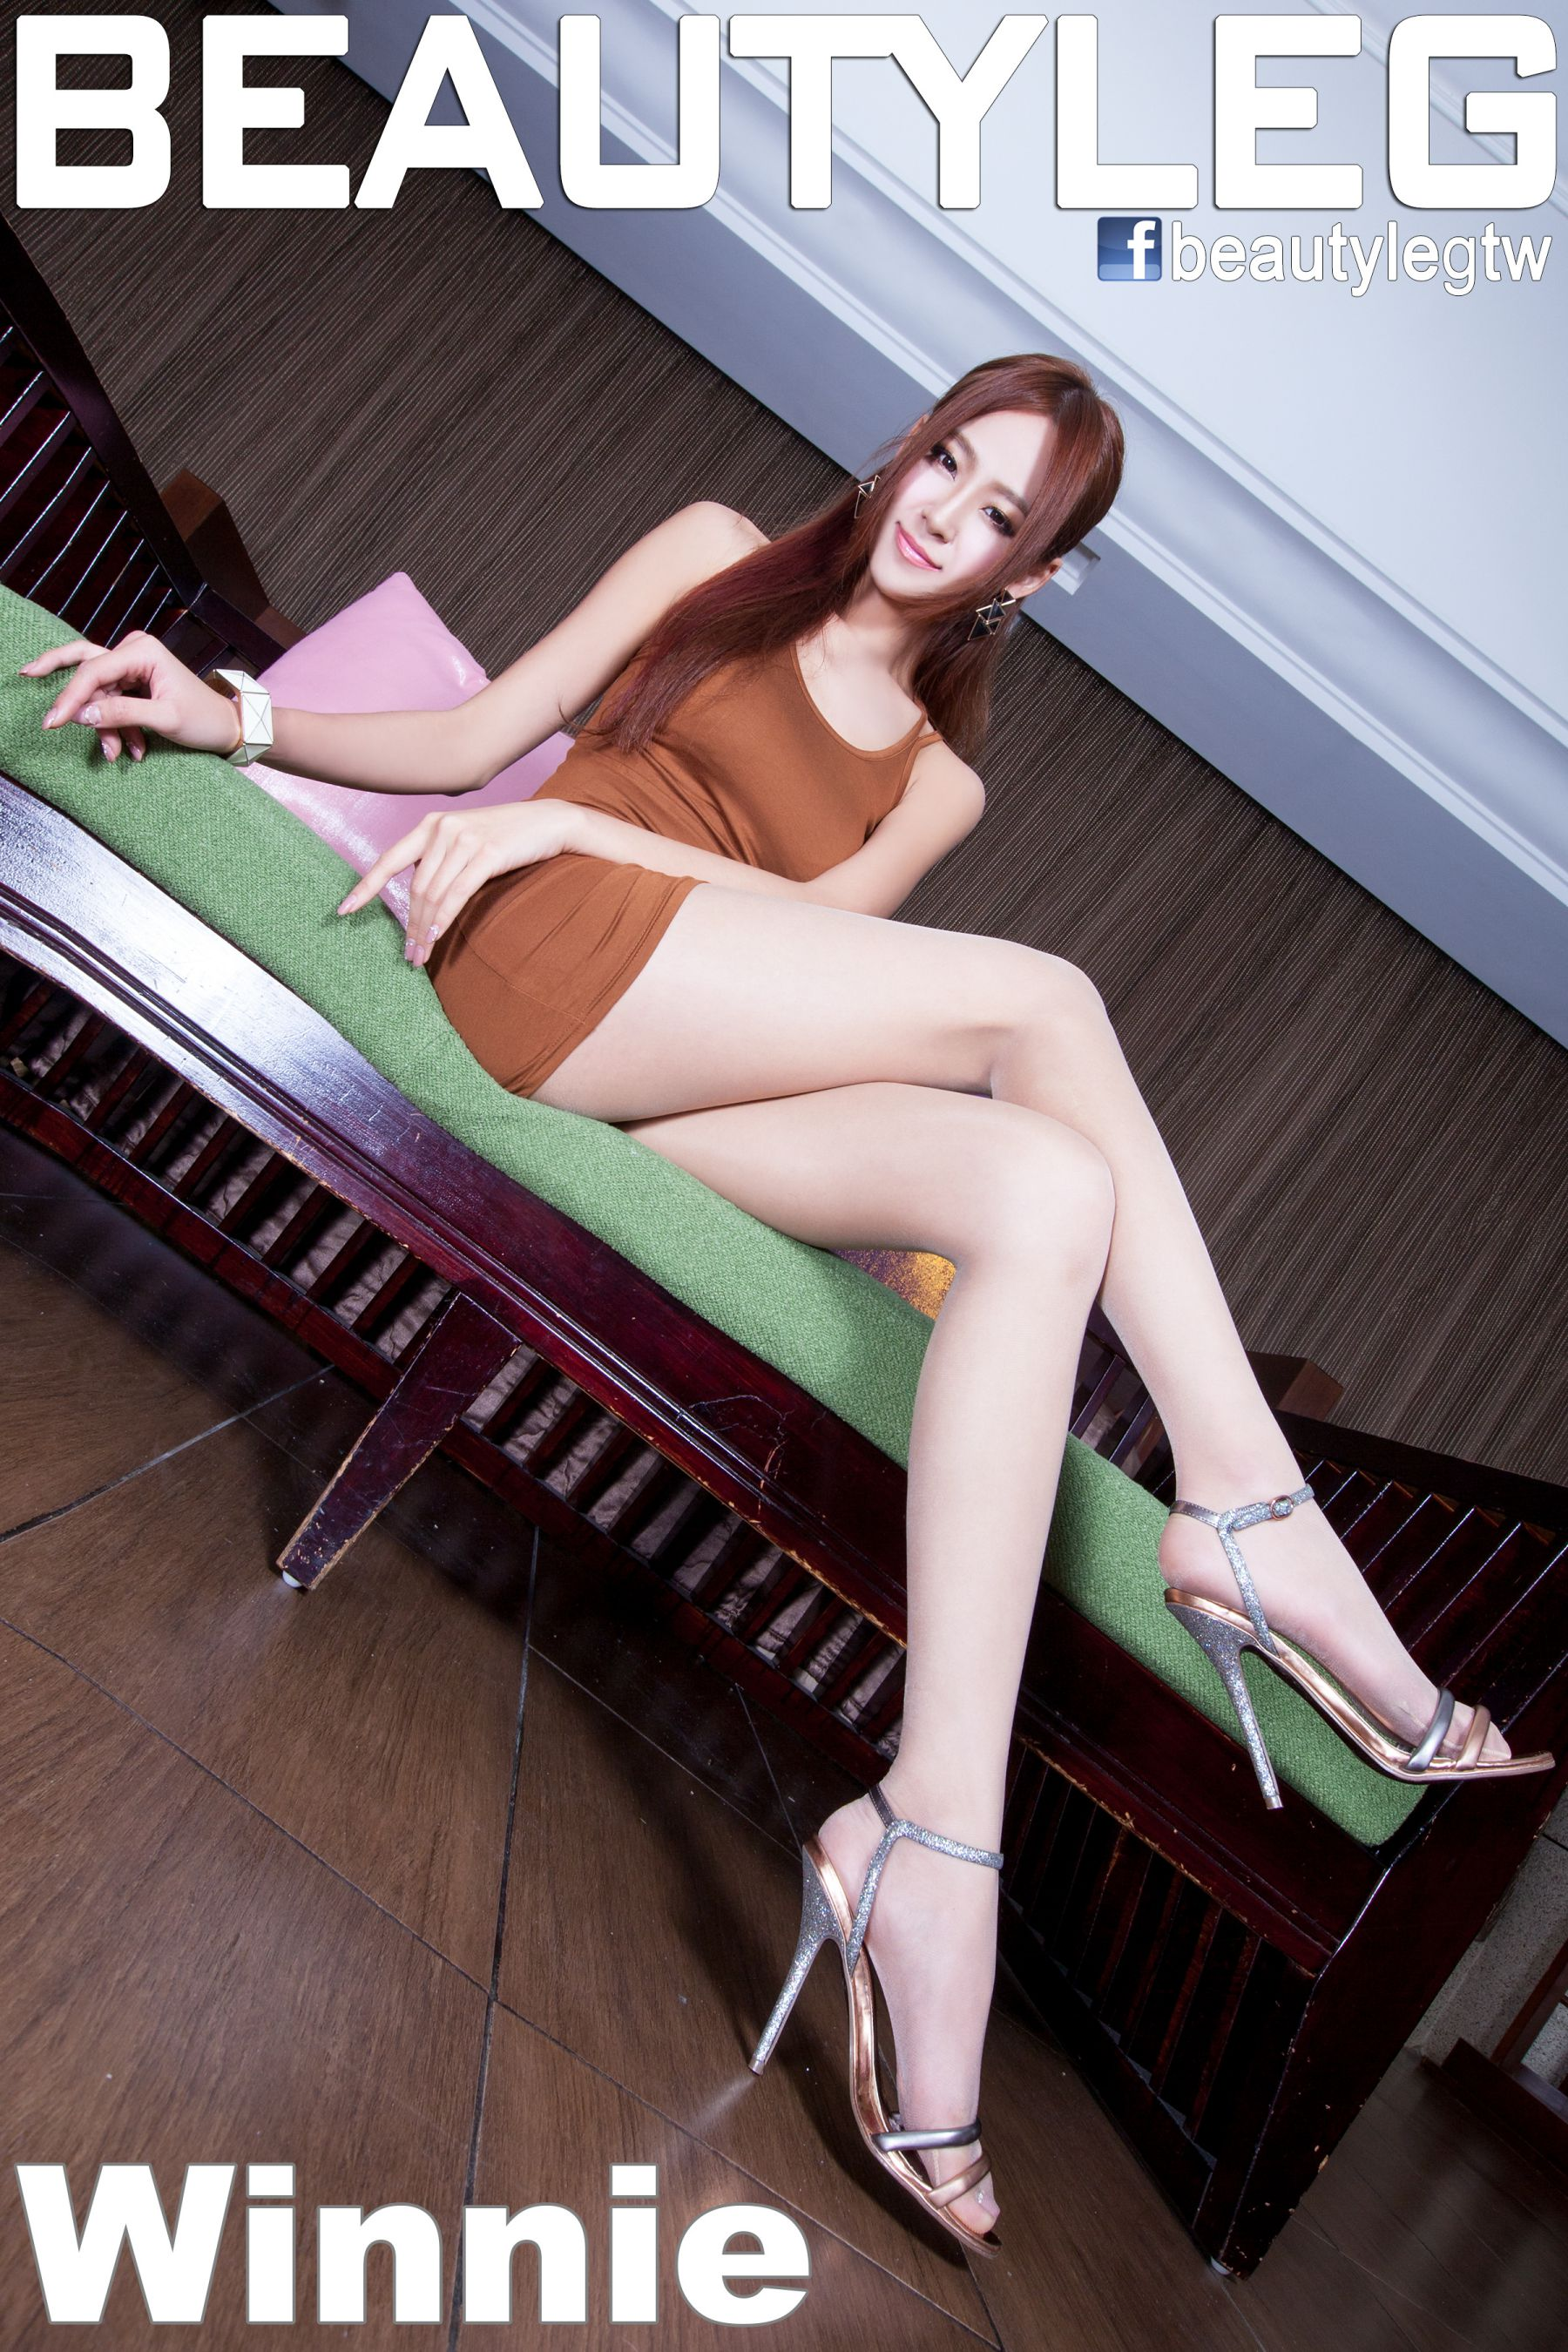 VOL.320 [Beautyleg]美腿:Winnie小雪(庄咏惠,庄温妮,腿模Winnie)高品质写真套图(41P)